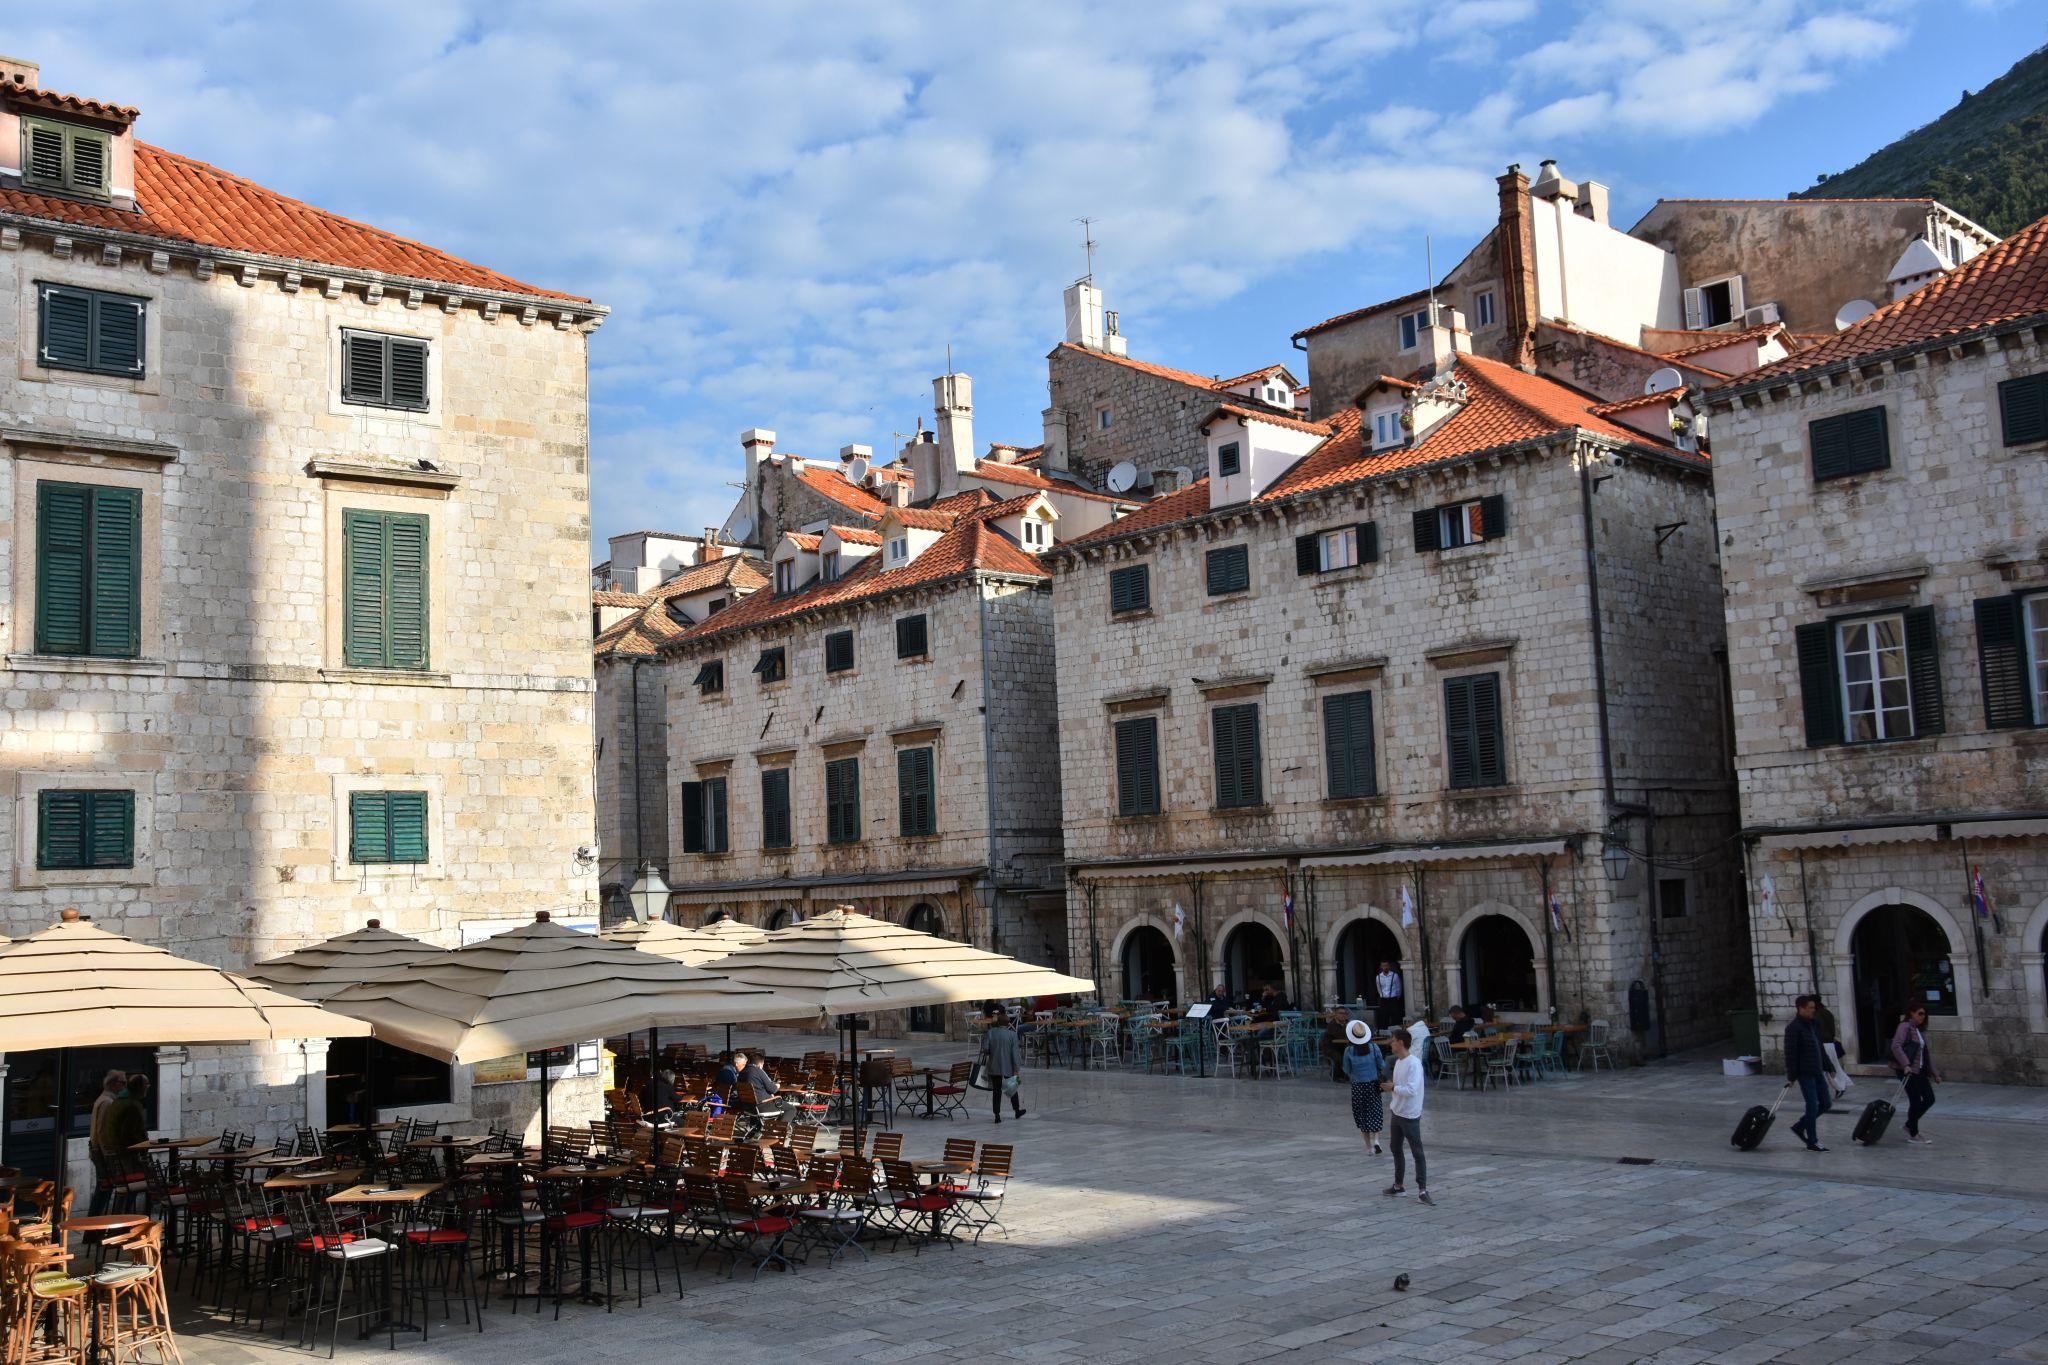 Dubrovnik Stradun, Croatia